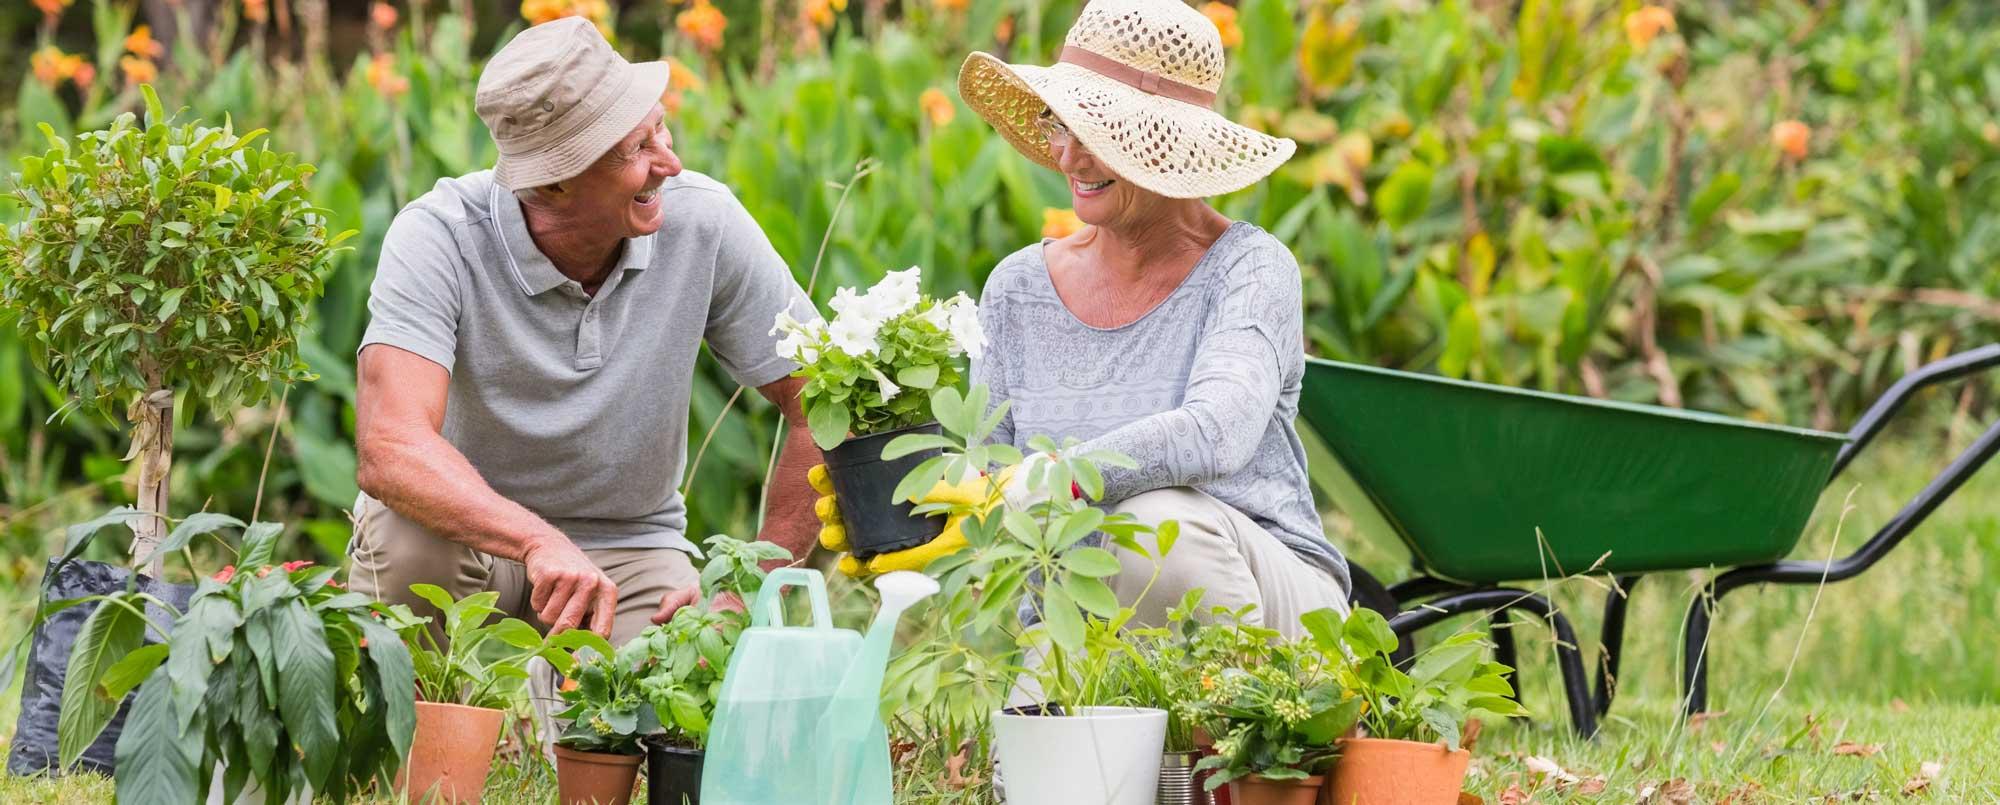 anziani-giardinaggio-hobby